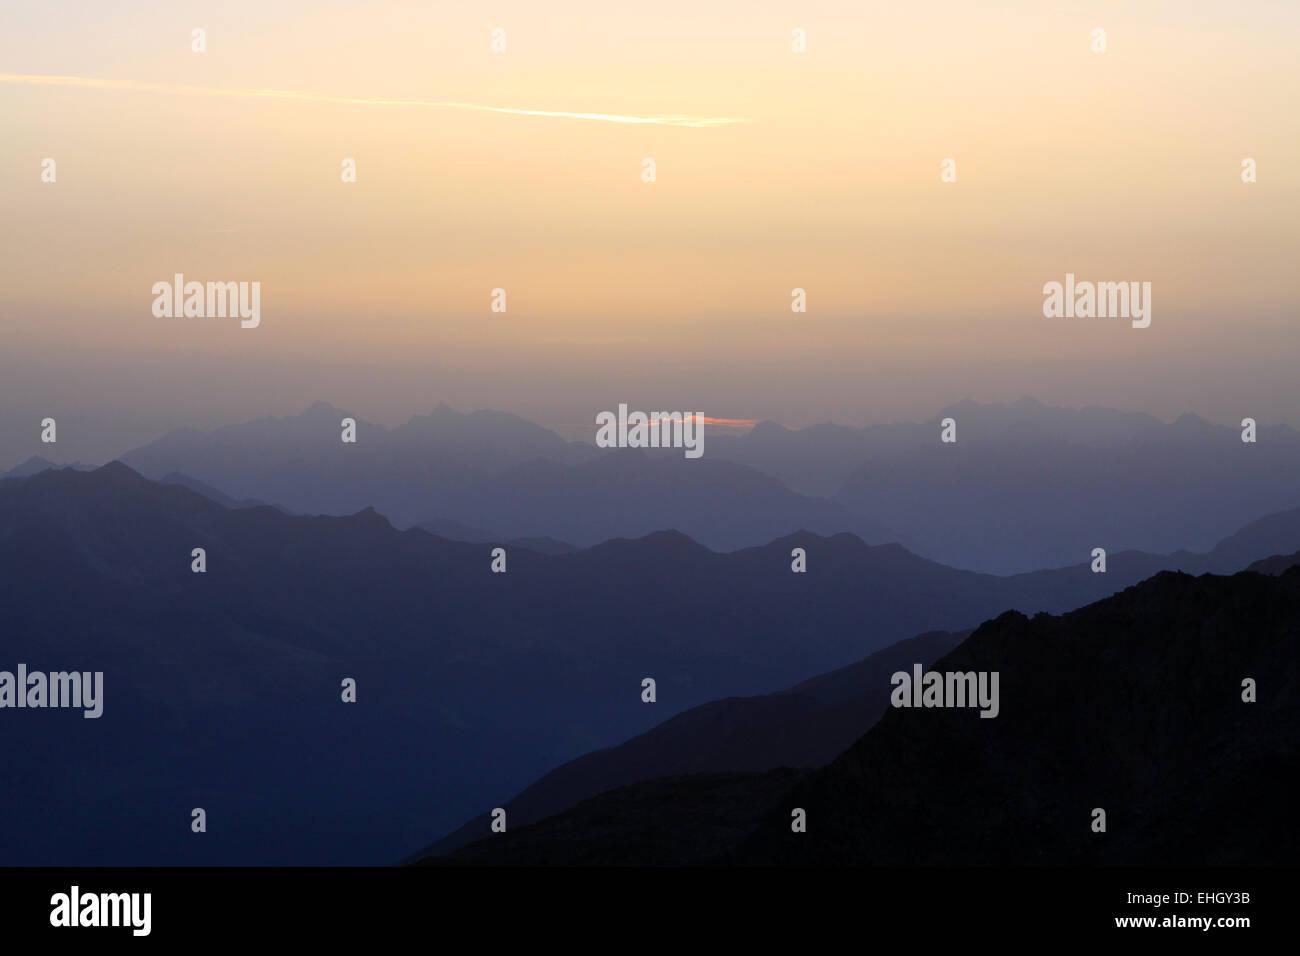 sinrice in the alps Stock Photo